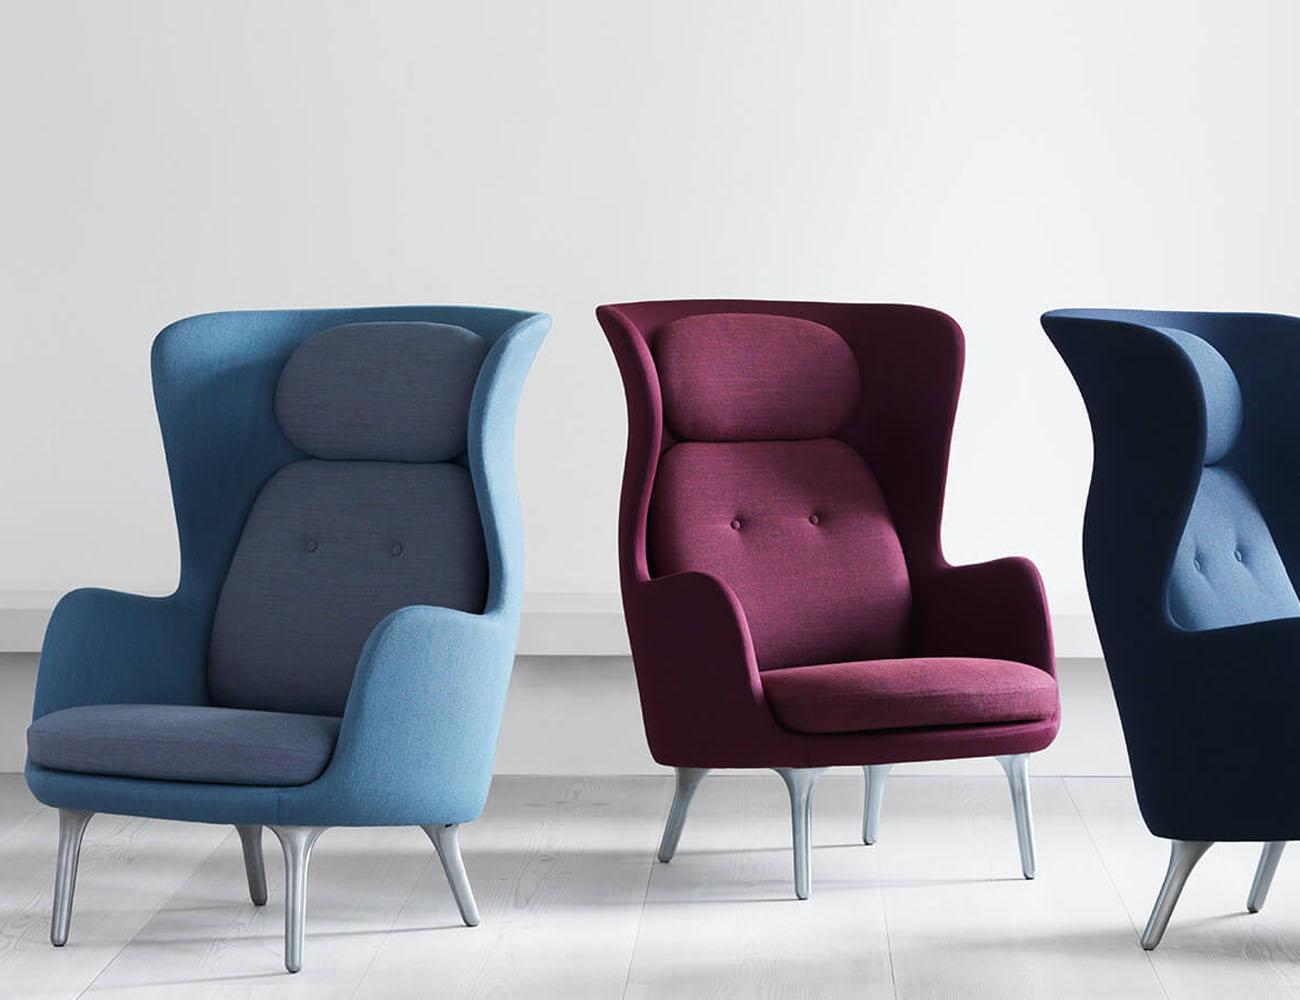 Ro Wingback Chair by Fritz Hansen  Gadget Flow